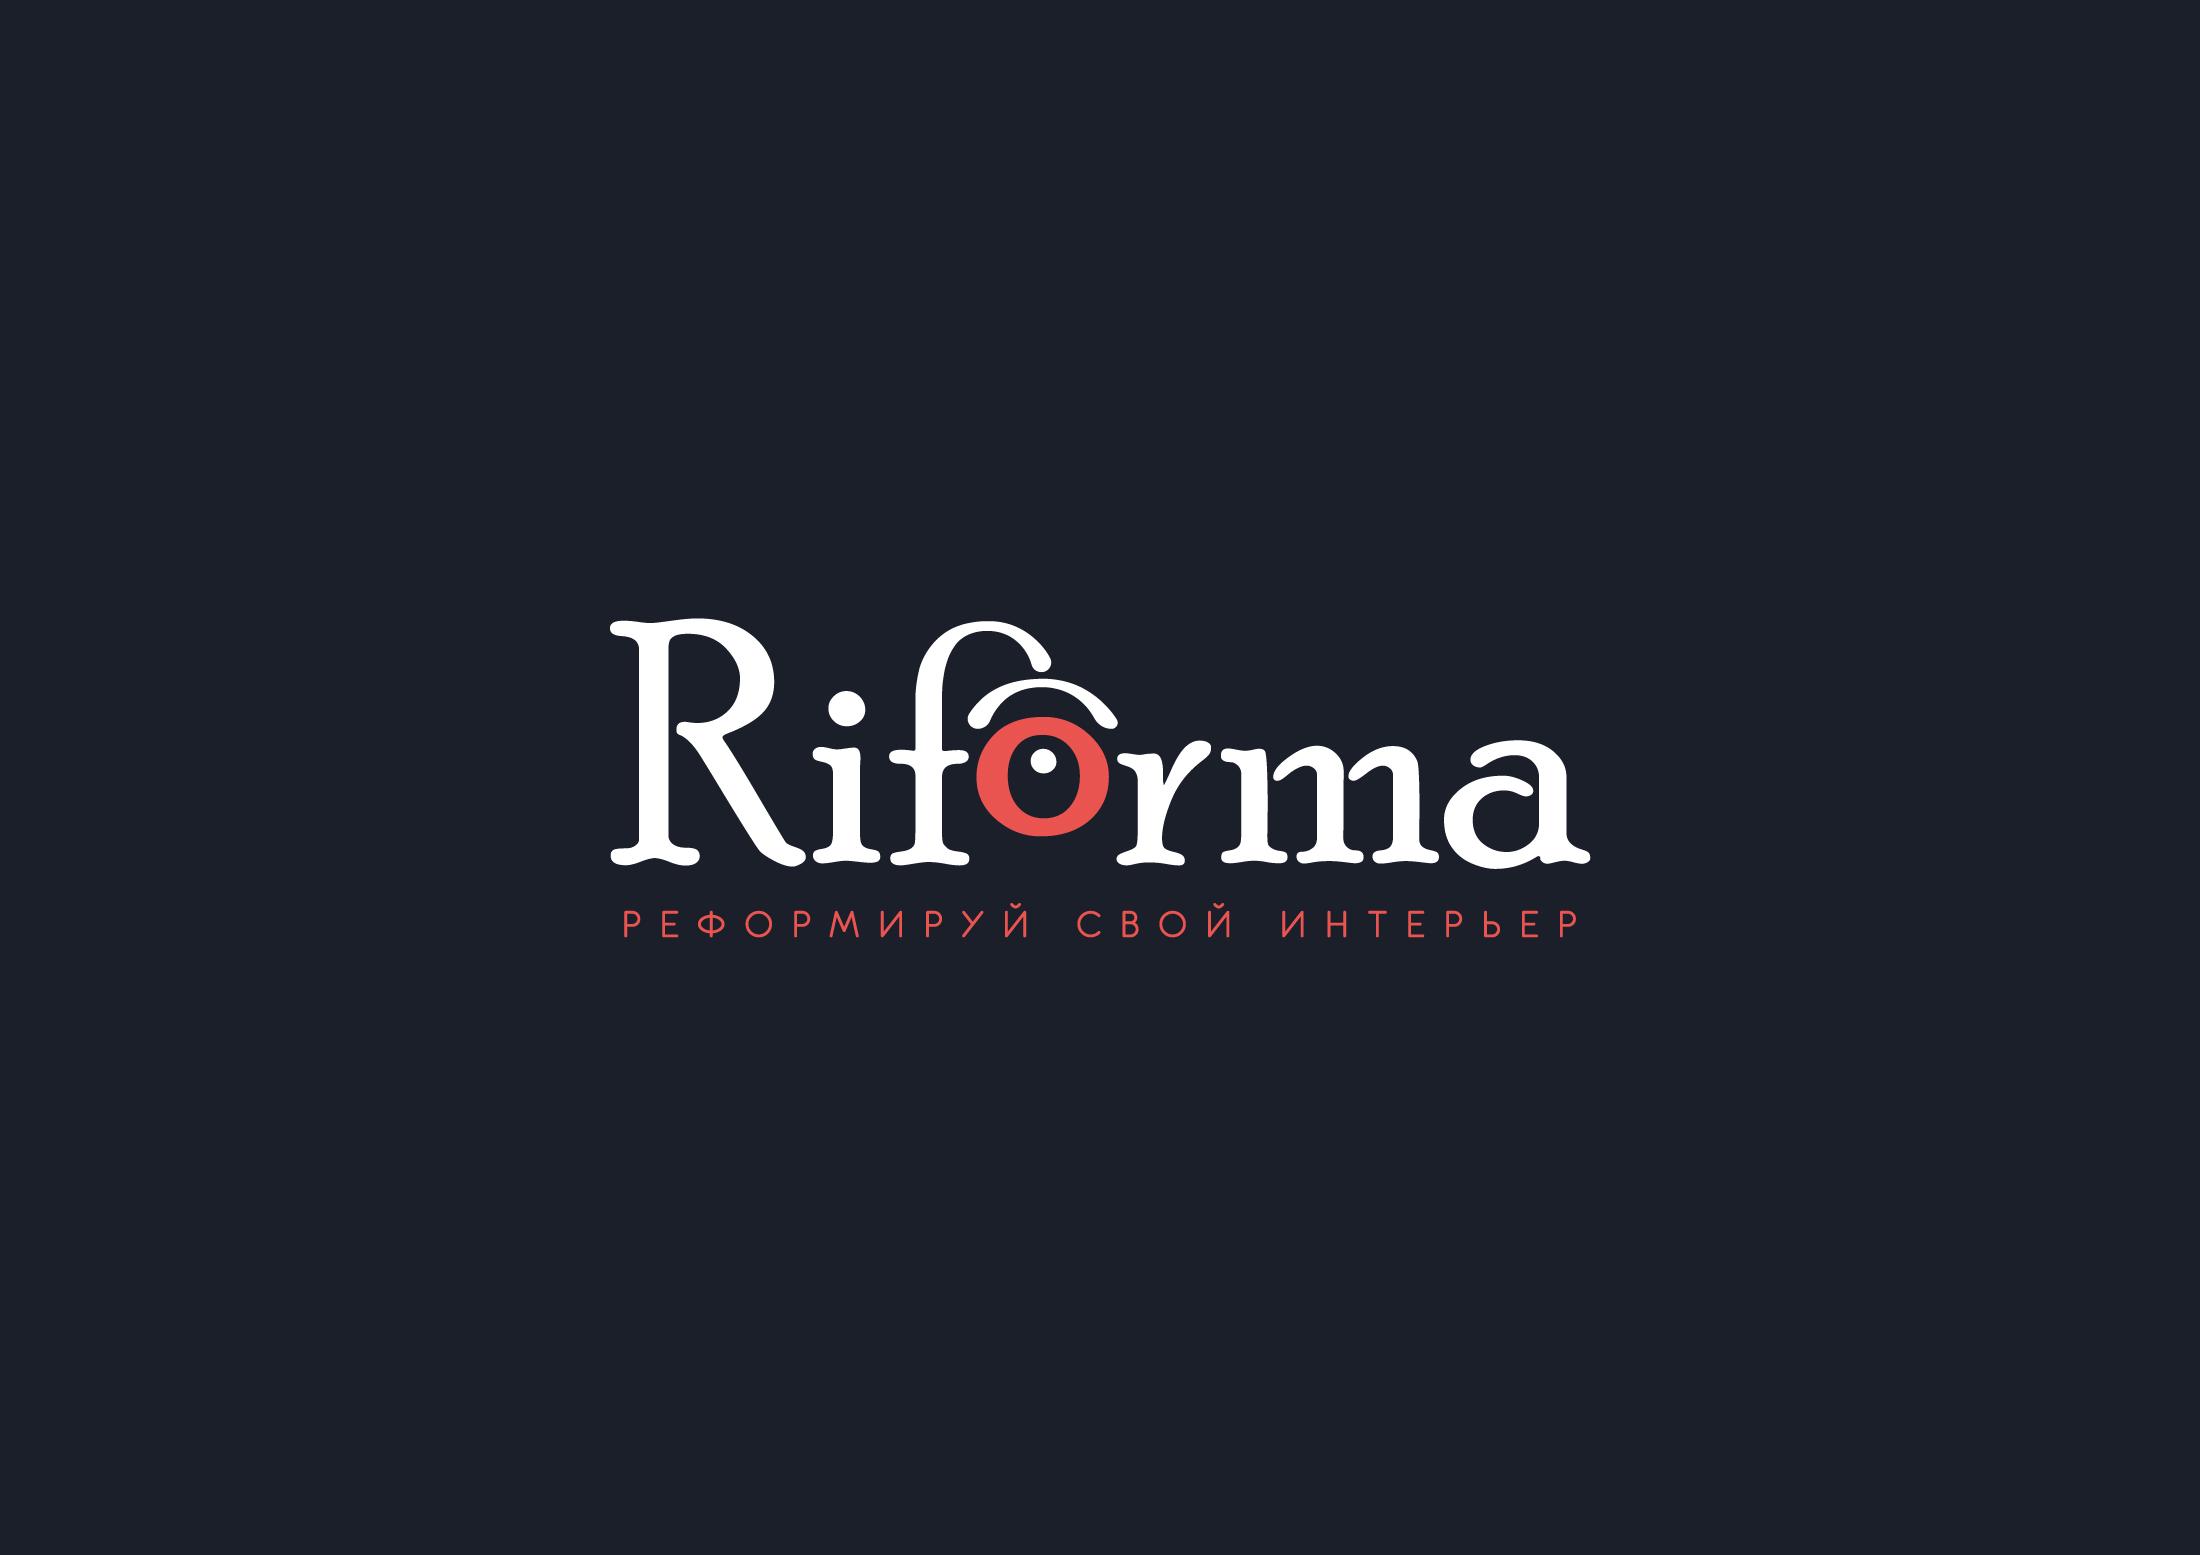 Разработка логотипа и элементов фирменного стиля фото f_25857933c30bf66f.jpg